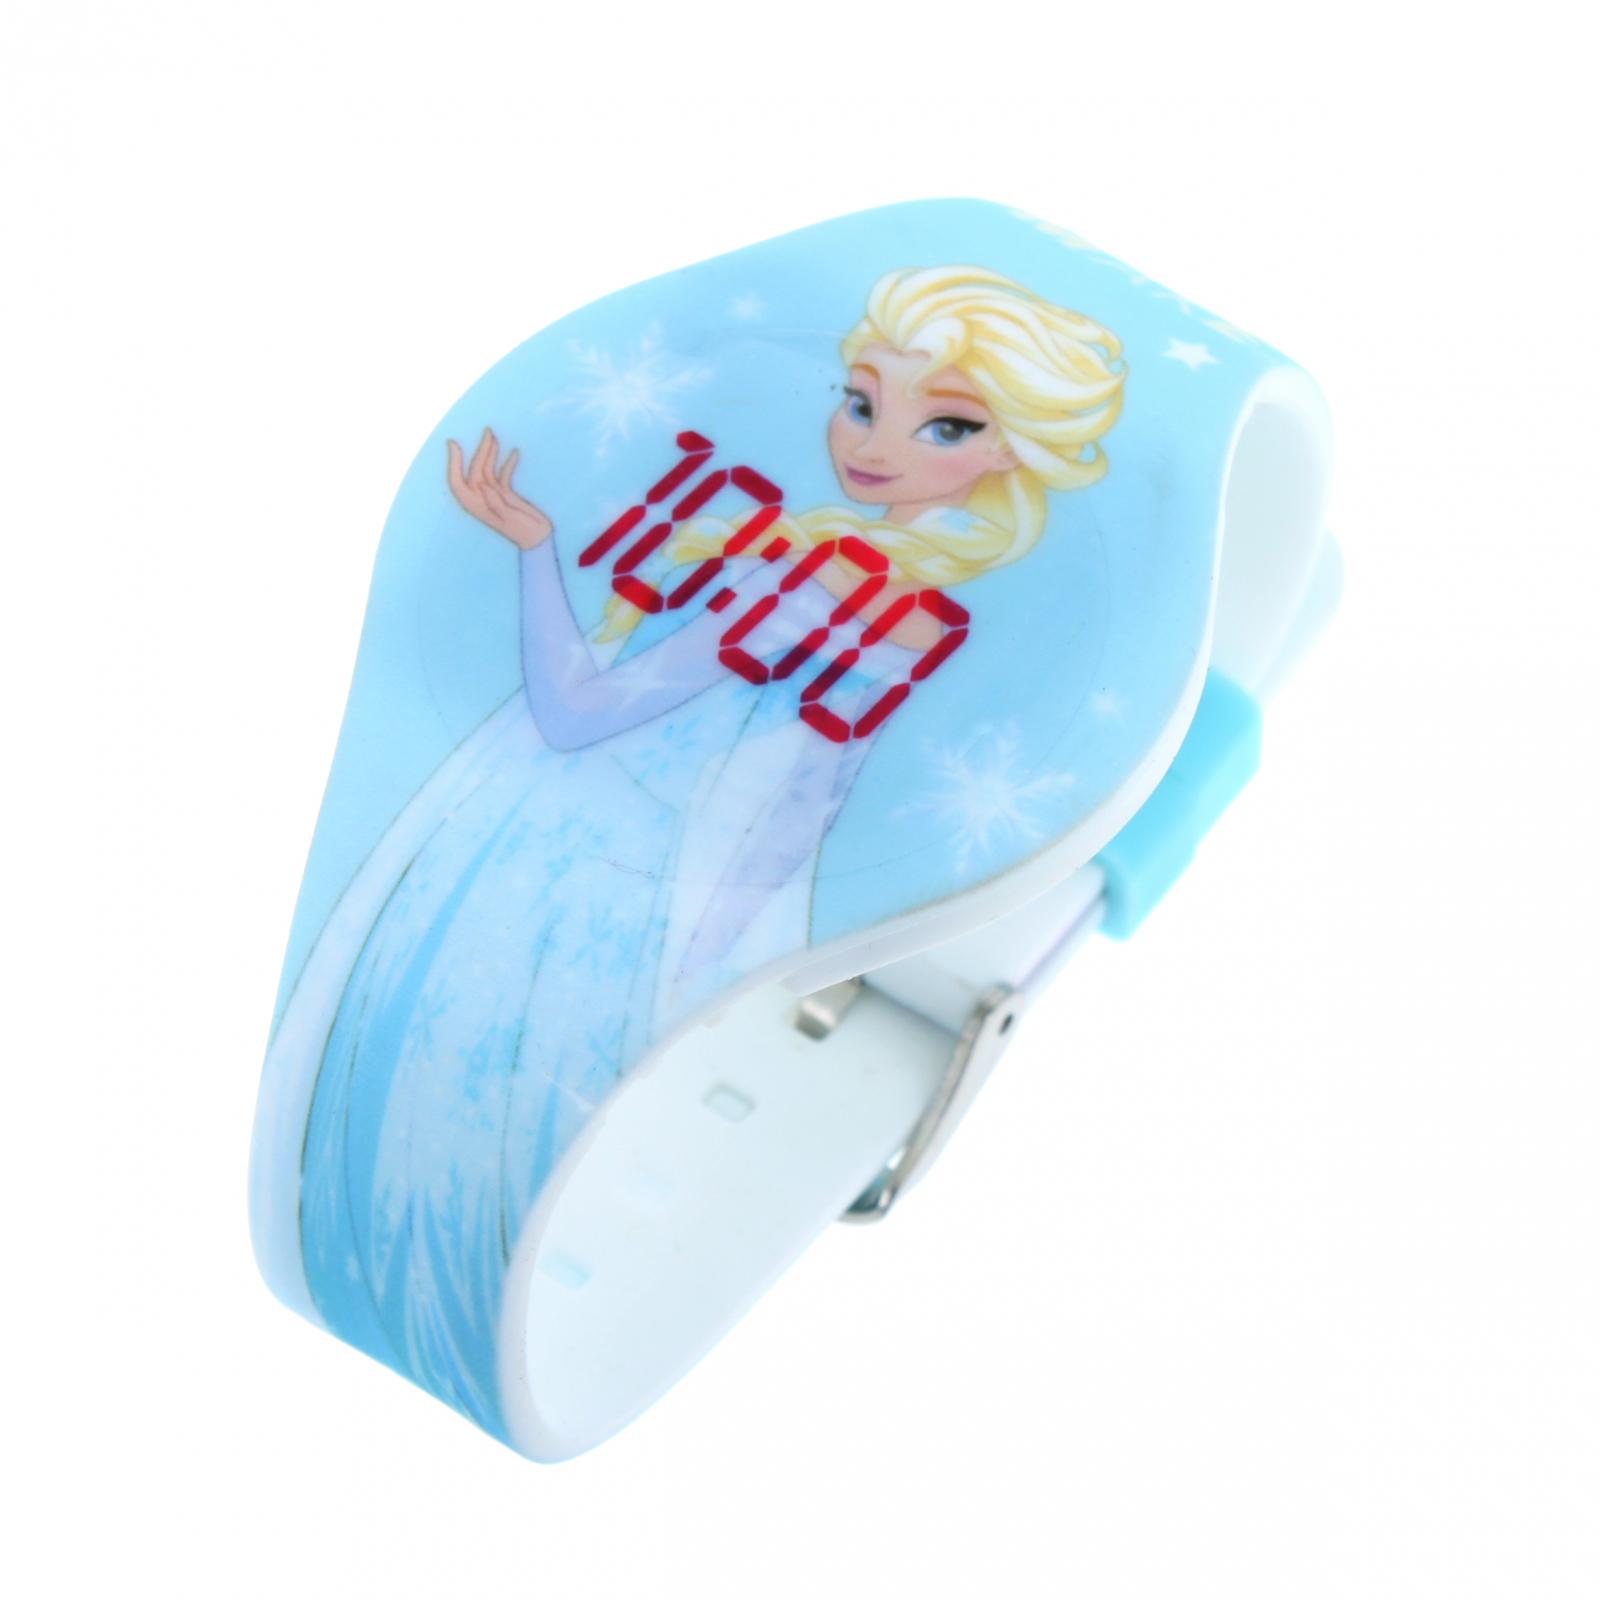 Disney Frozen 2 Princess Elsa Digital Touch LED Wrist Watch